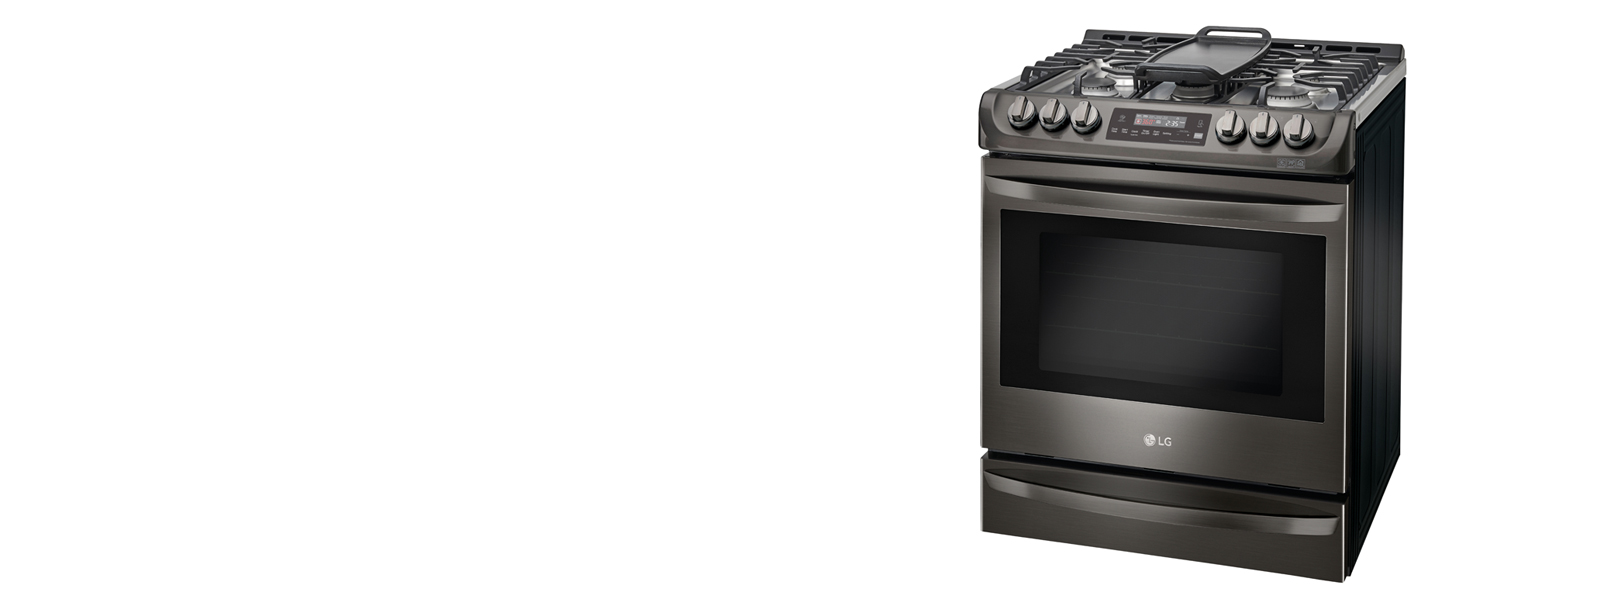 lssg3016st lg studio slide in gas range with warming drawer